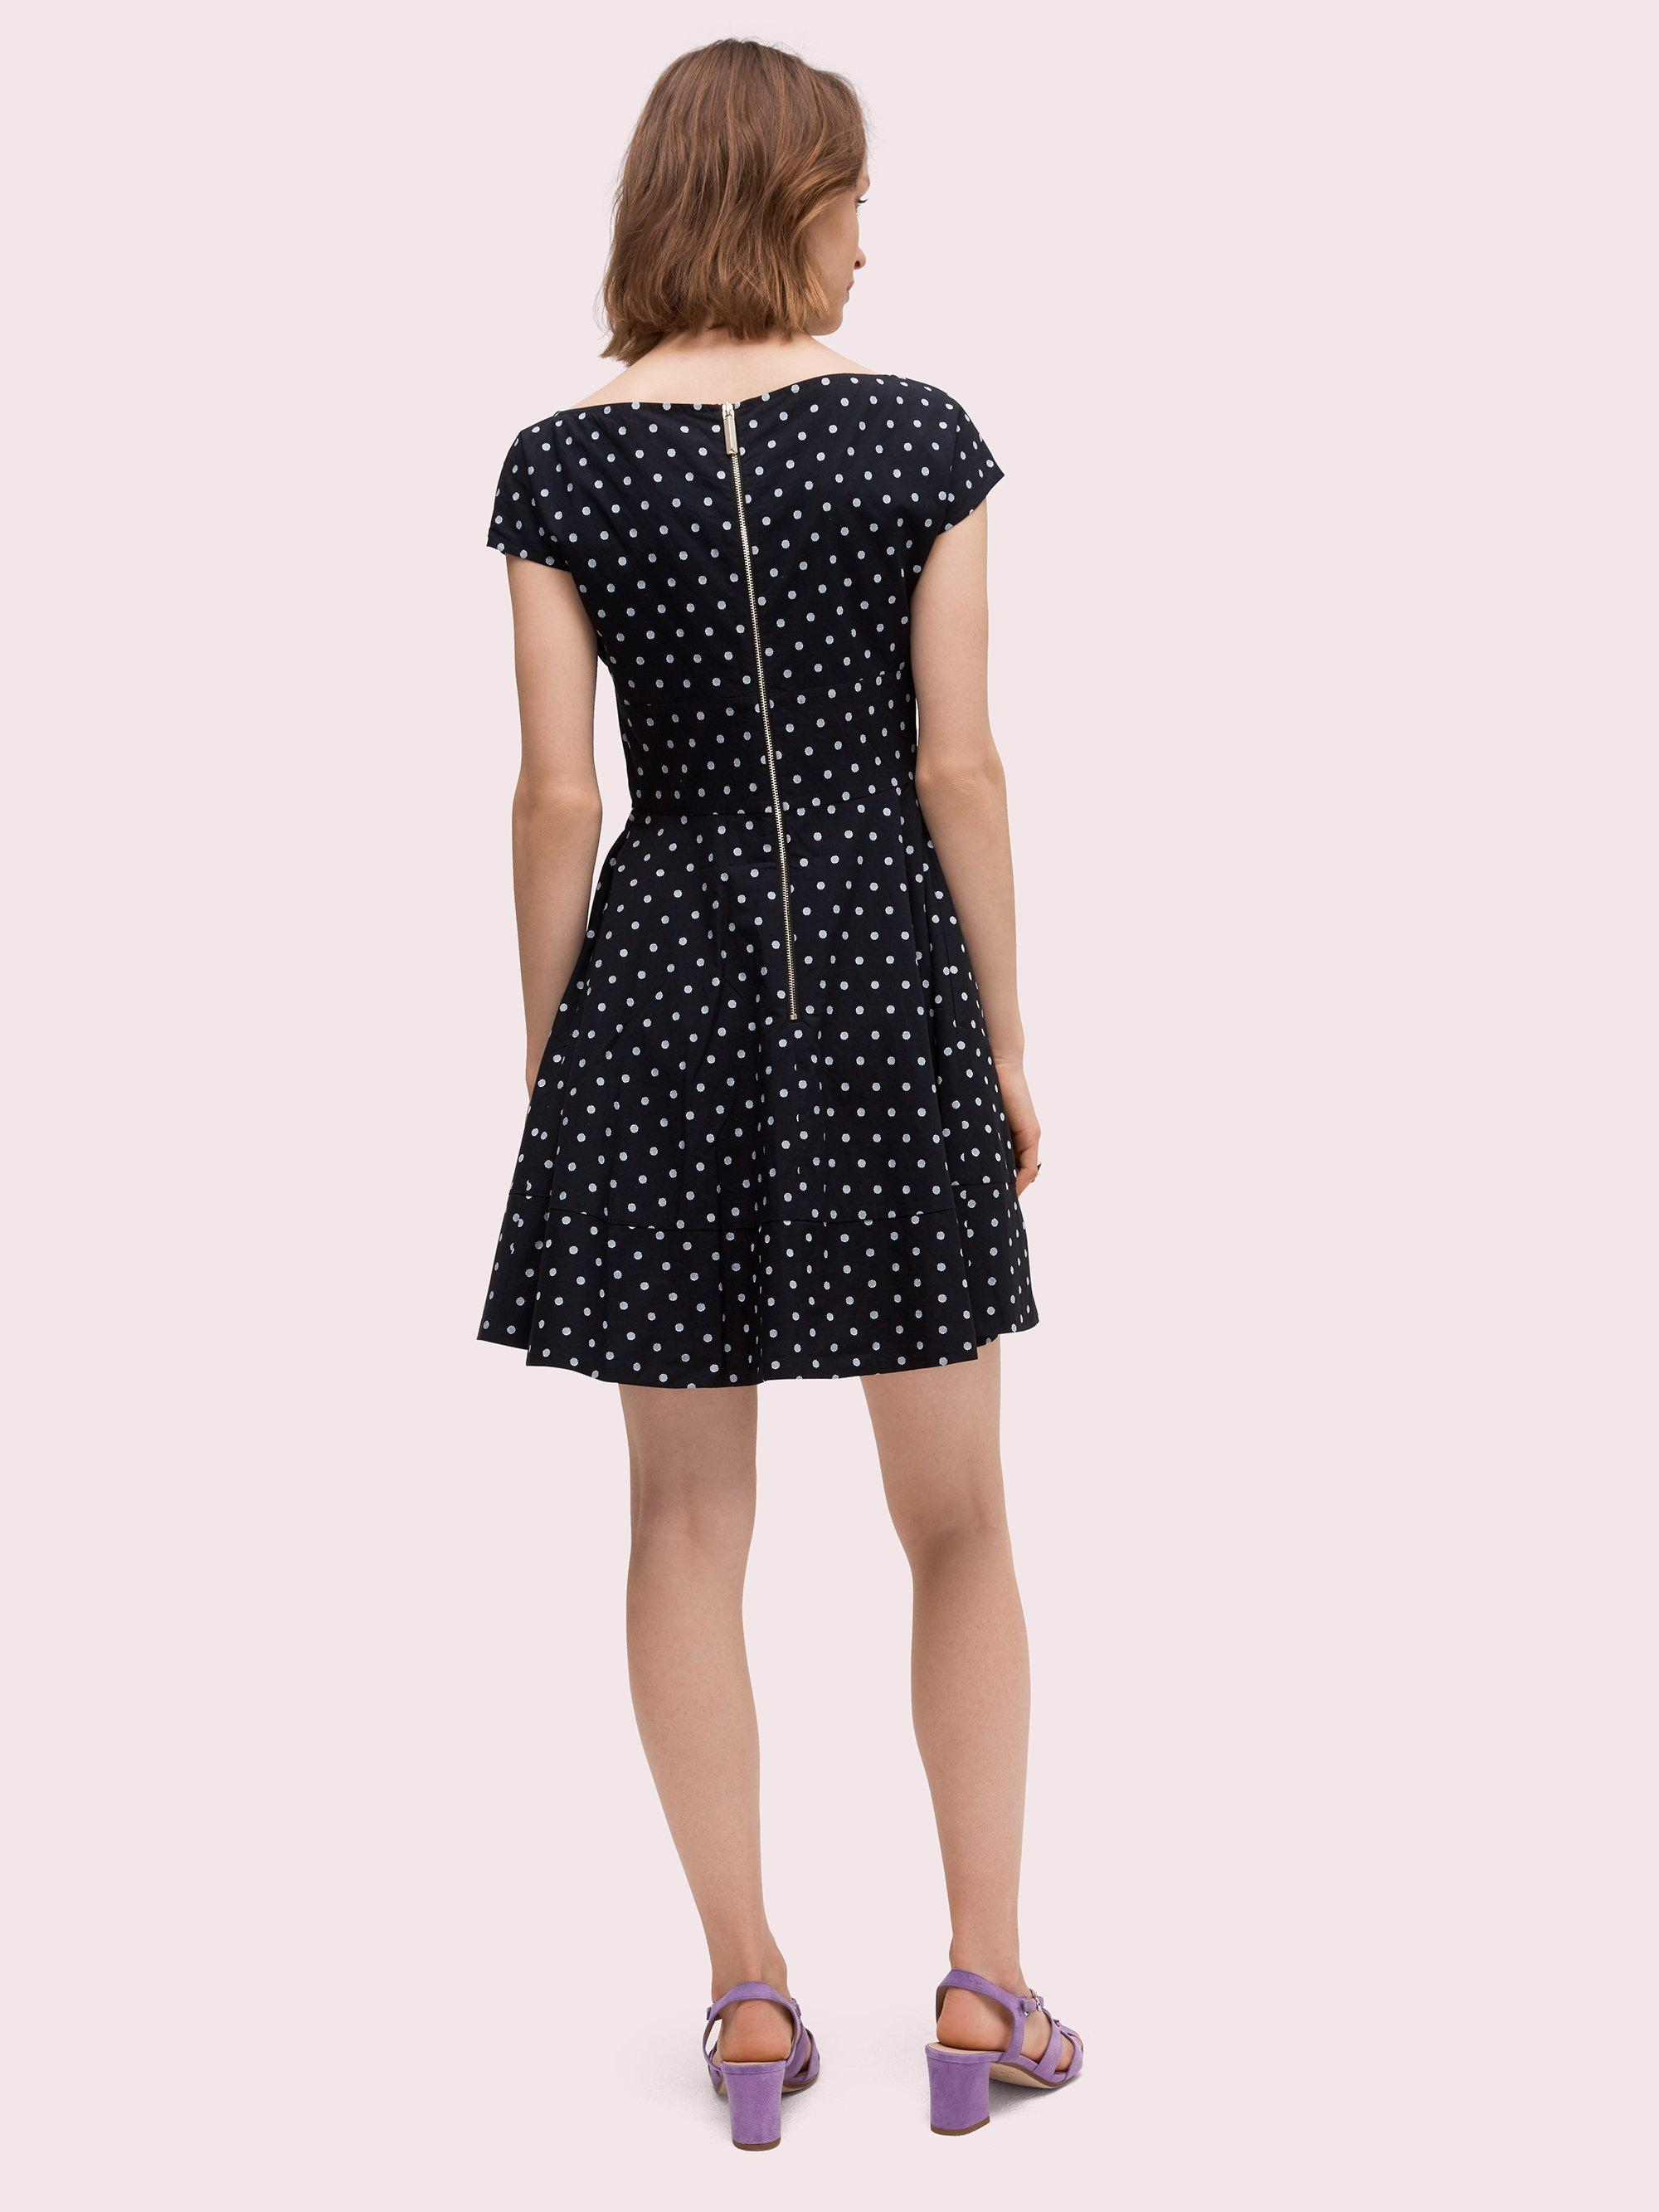 d200166fad6a Kate Spade - Black Dot Cotton Fiorella Dress - Lyst. View fullscreen